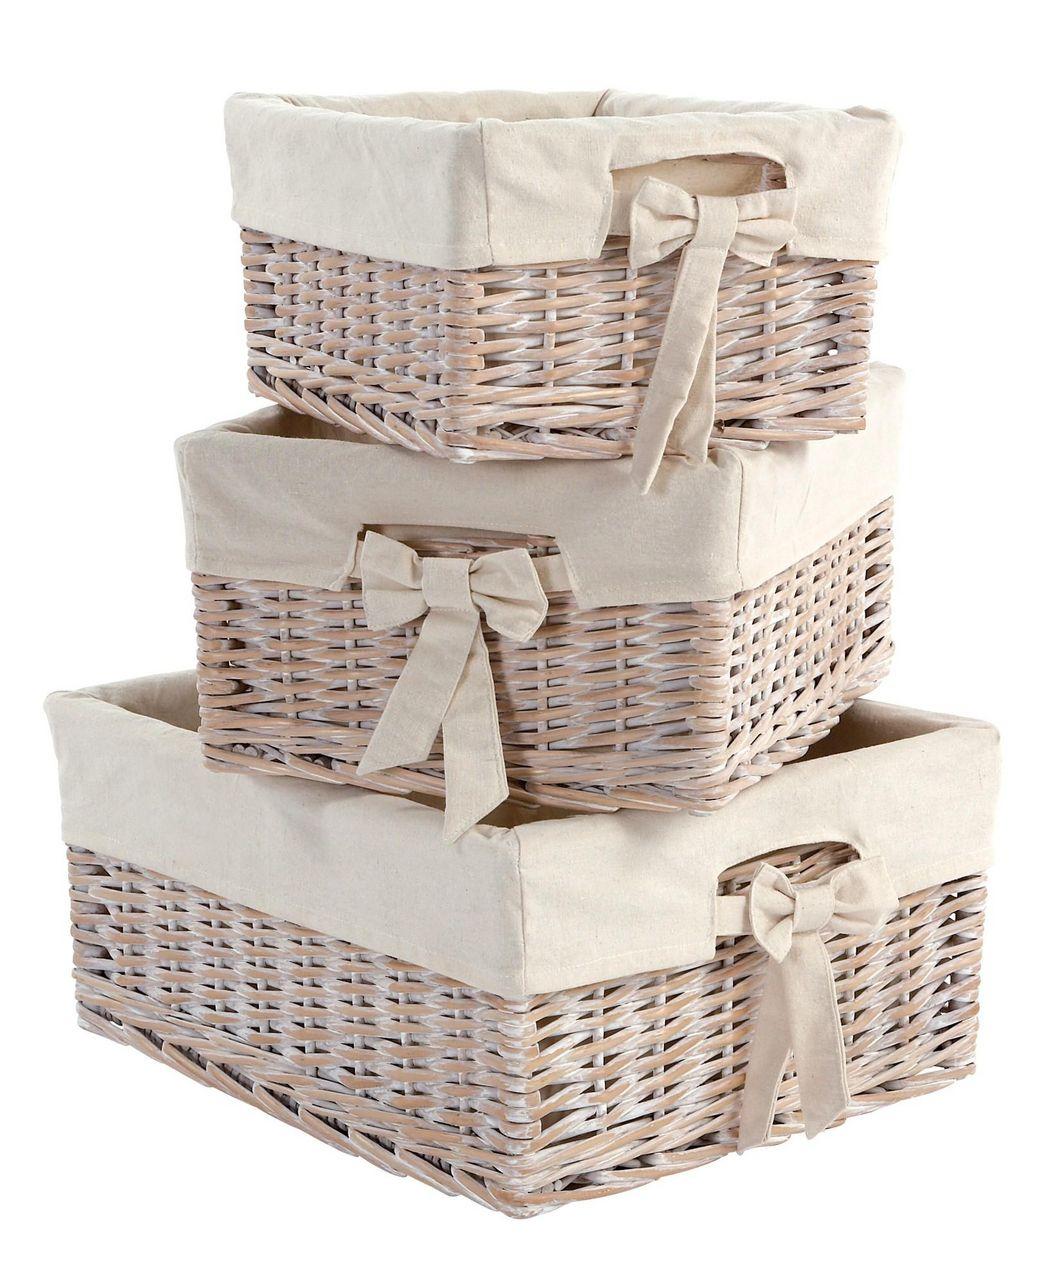 Storage Baskets Set Of 3 In White Wash Nursery Accessories Mamas Papas